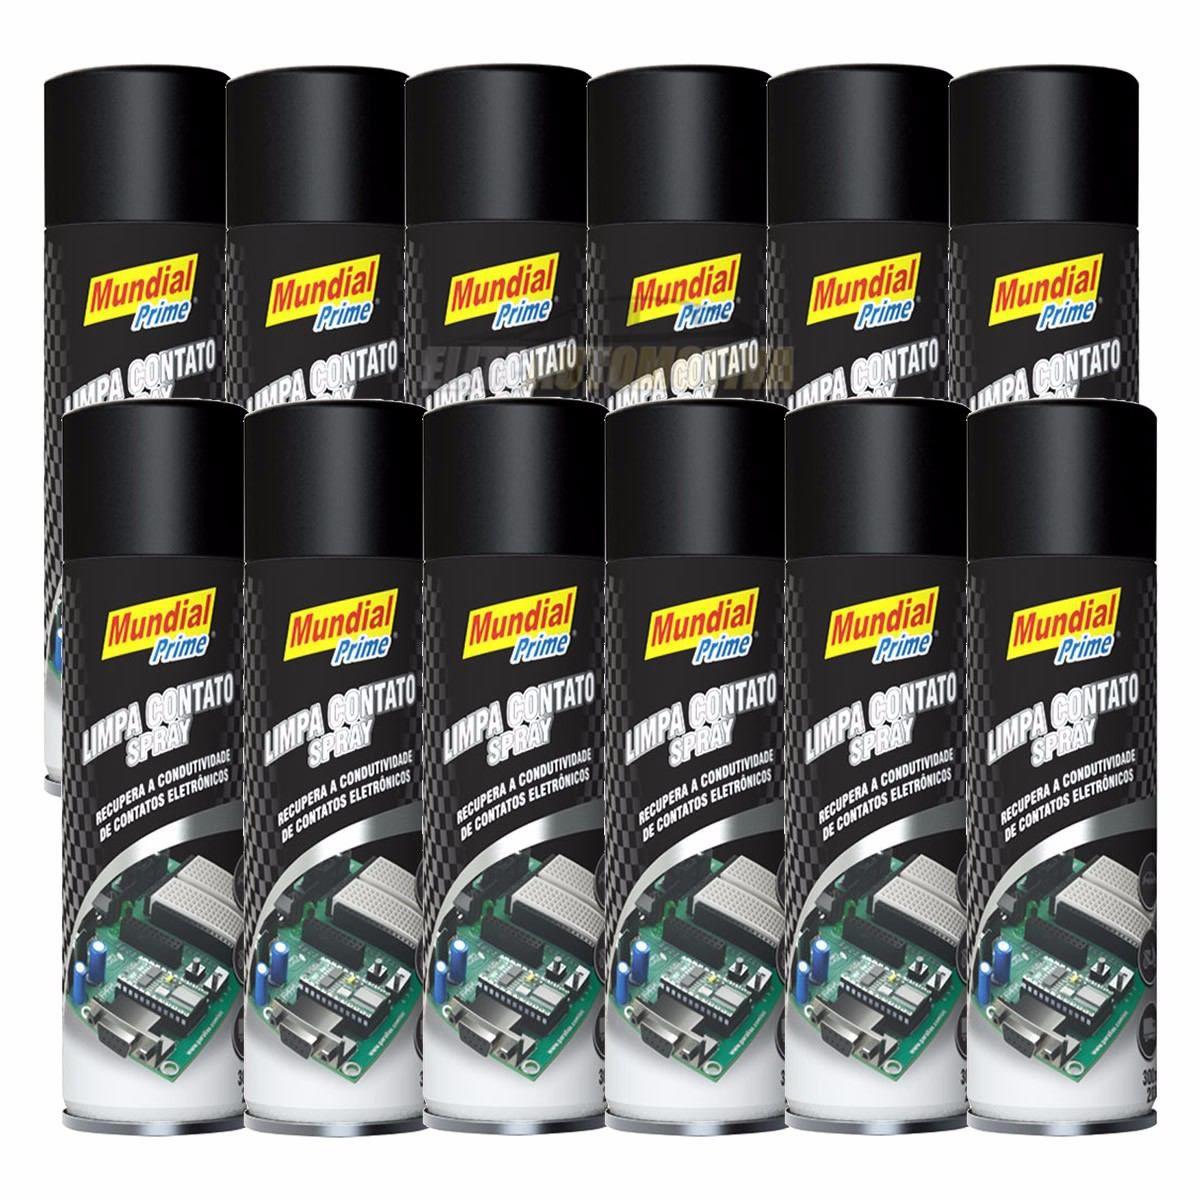 Kit Limpa Contato Elétrico 12 Unidades Mundial Prime Spray 300ml